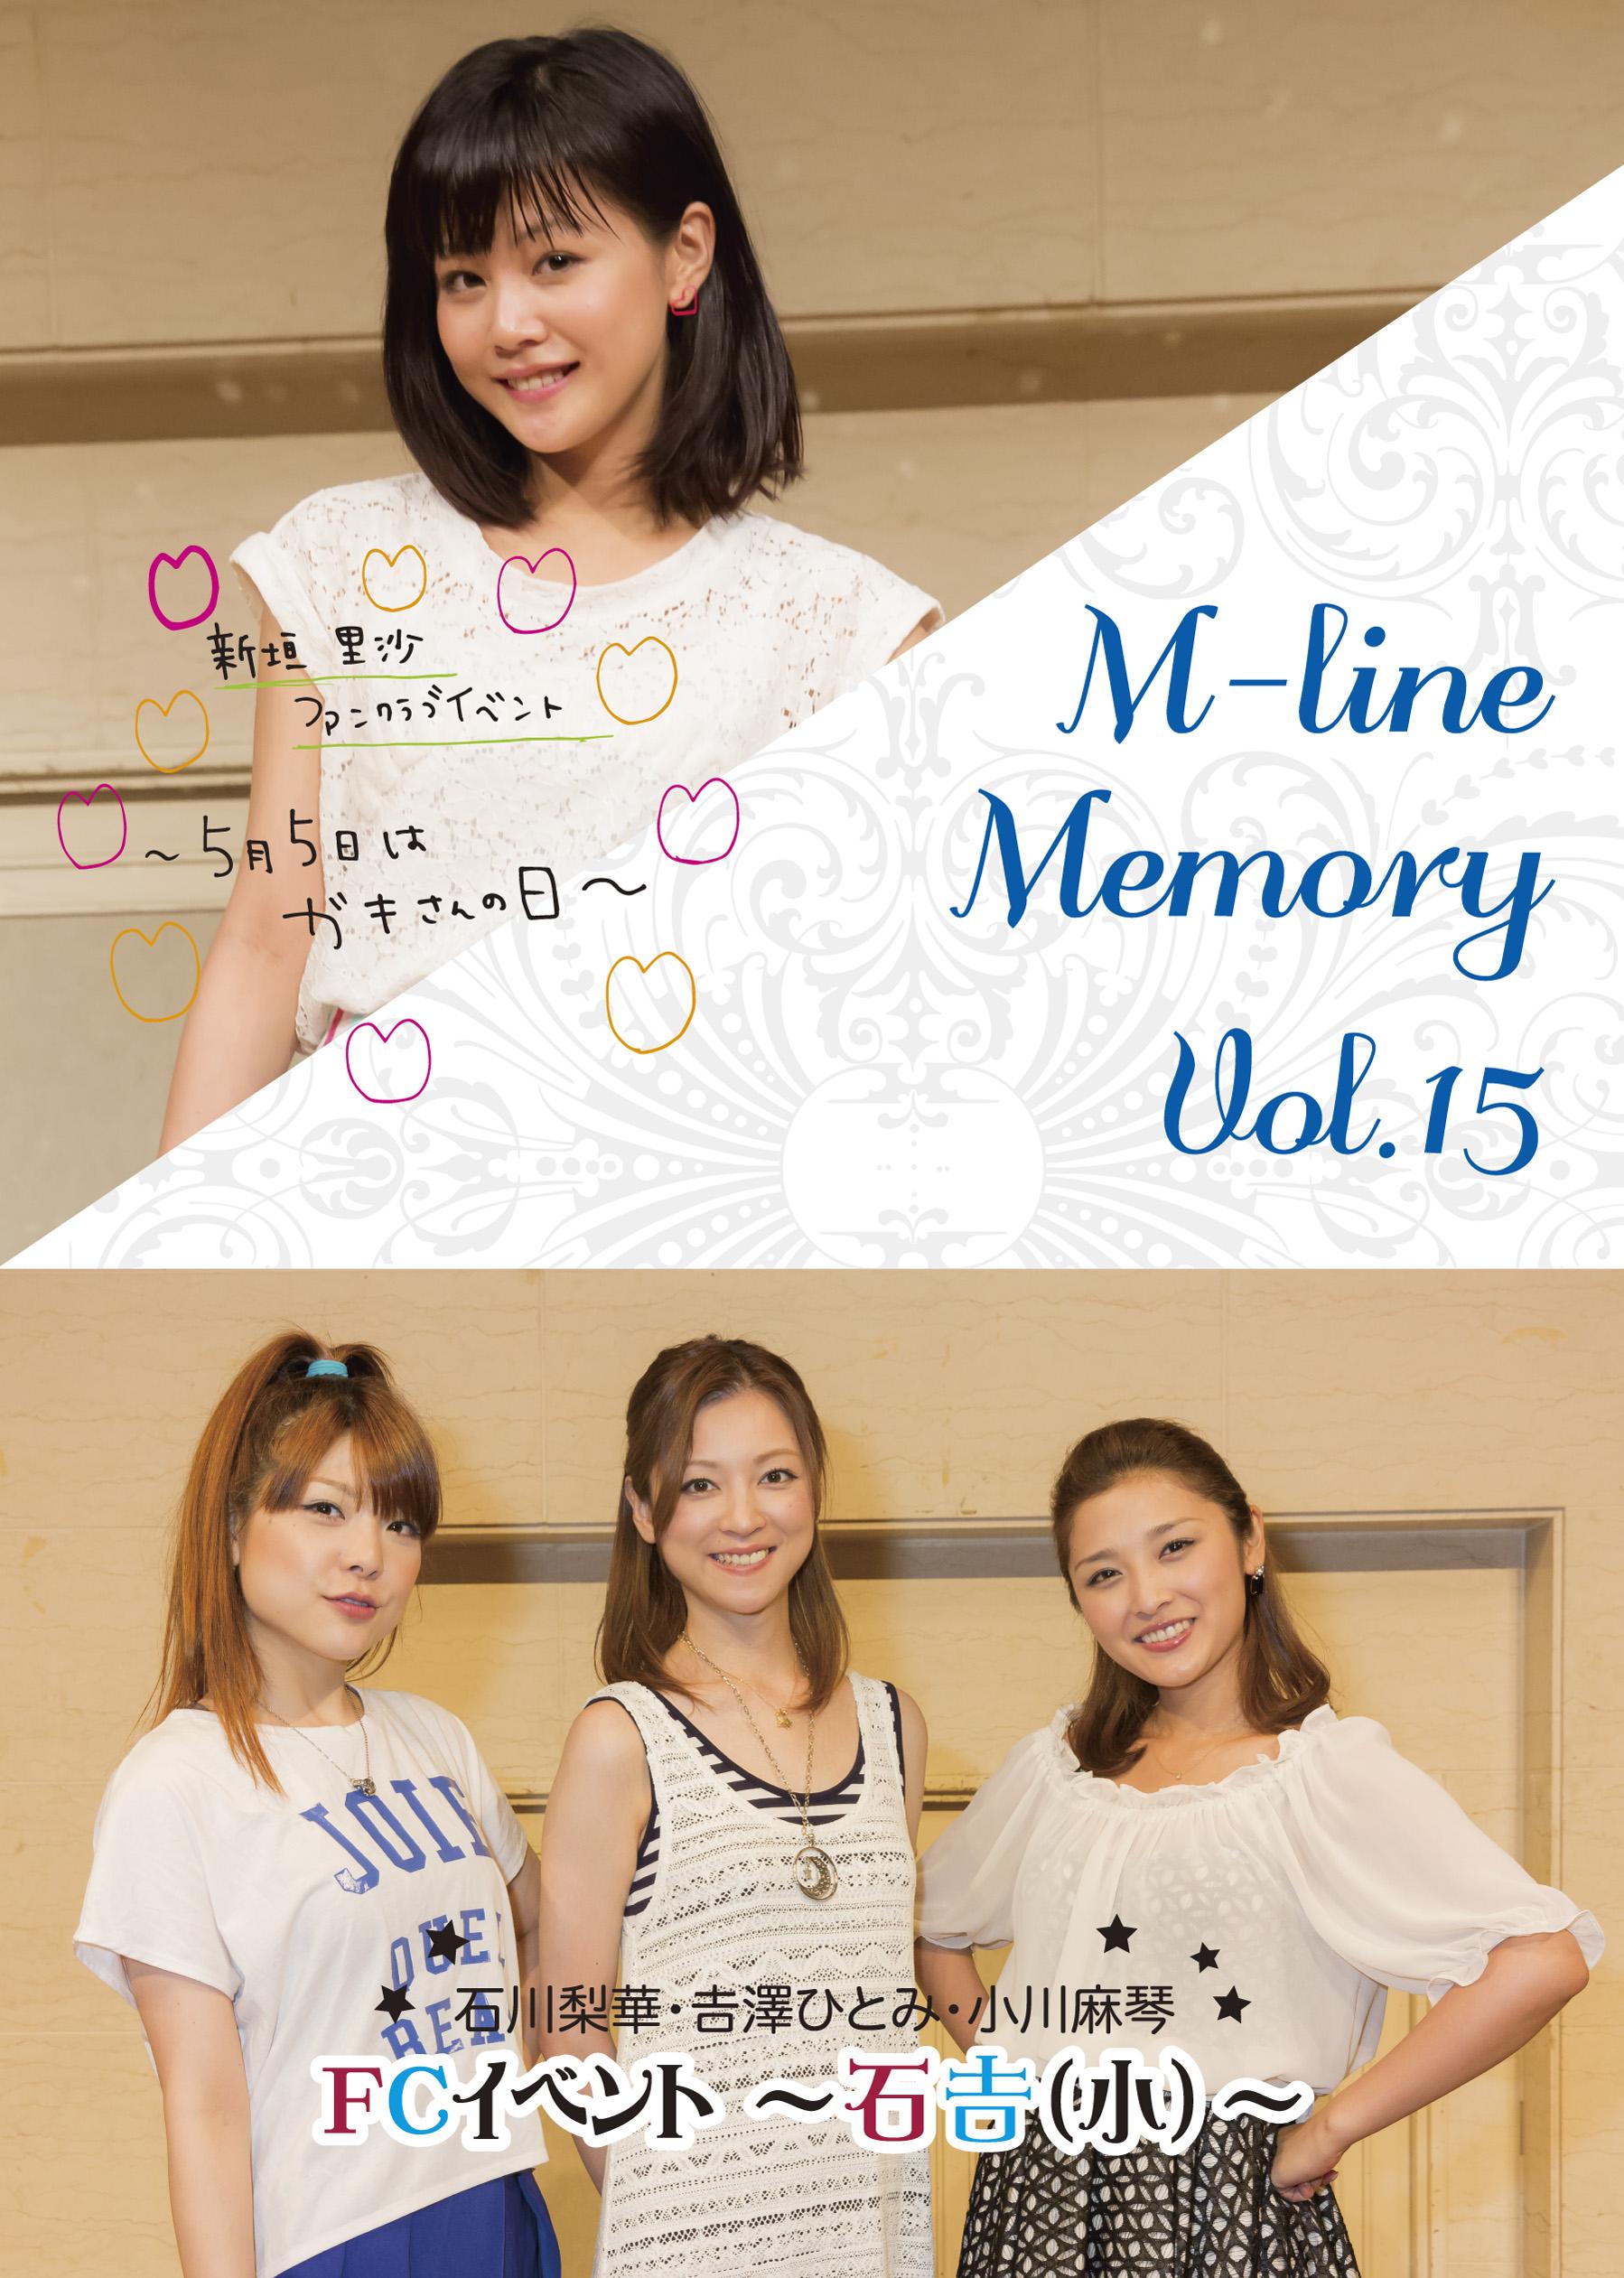 M-line Memory Vol.15